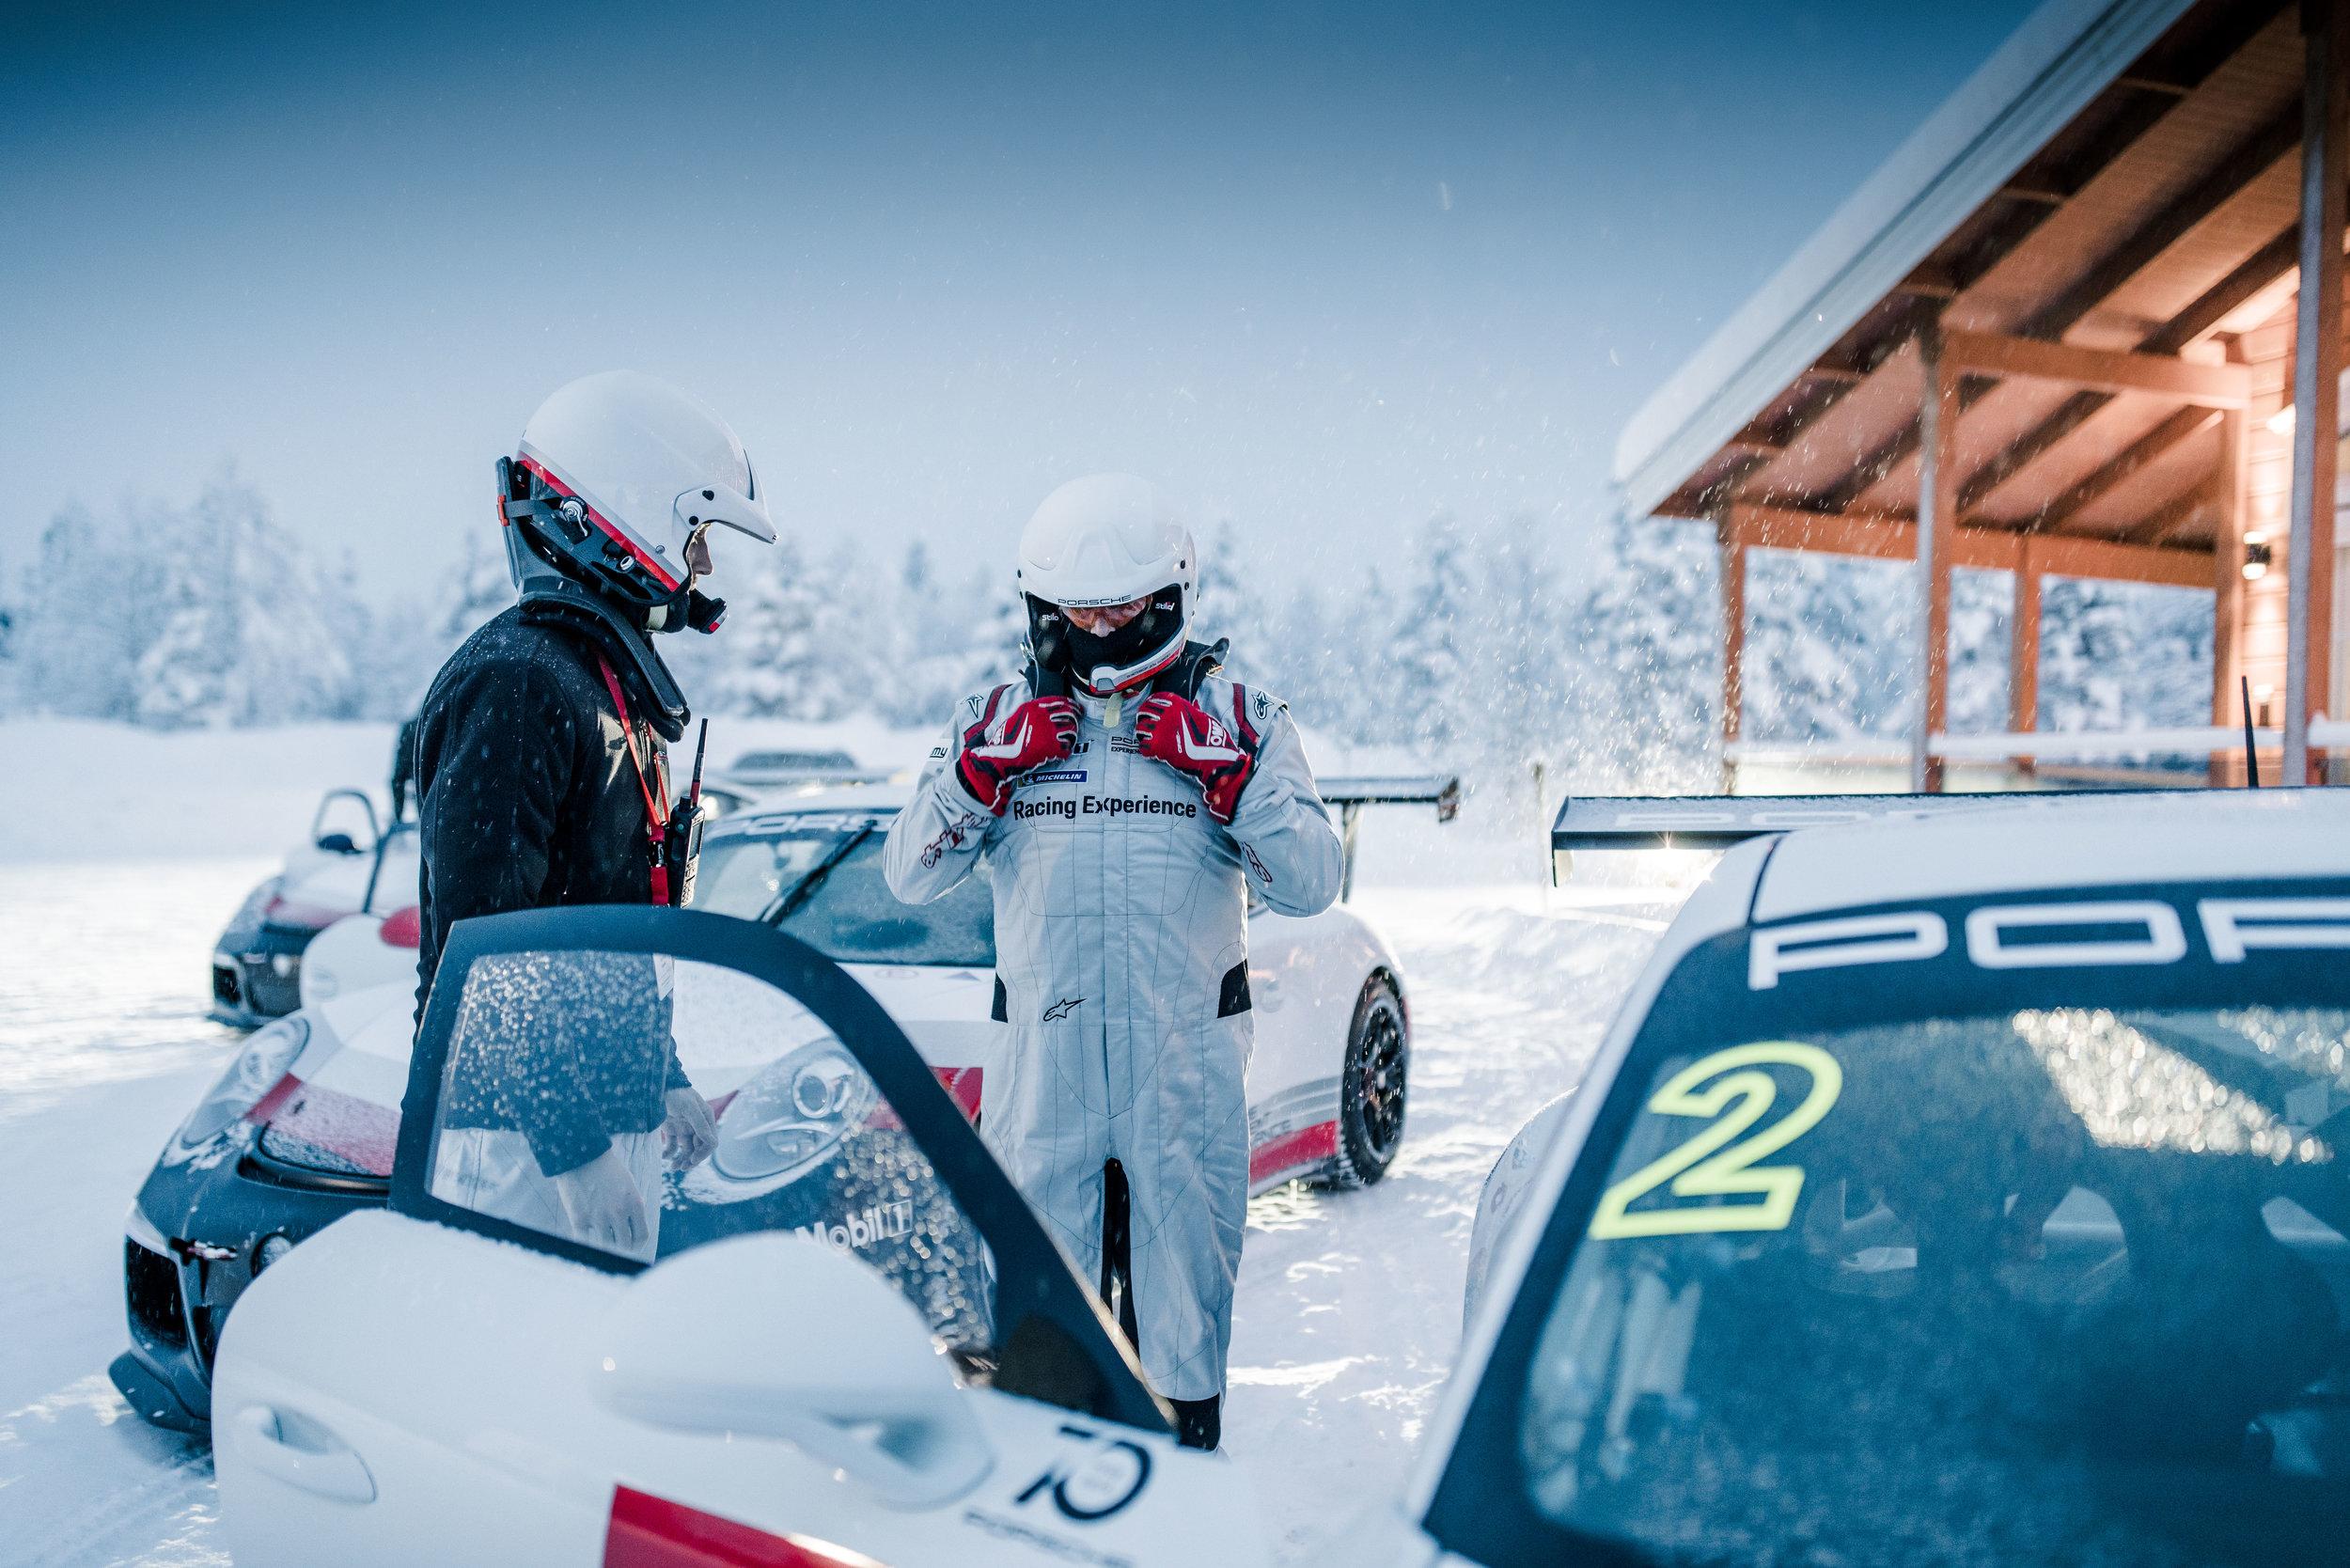 Porsche Ice Experience on Ice_30_01_2019_0081_175607.jpg